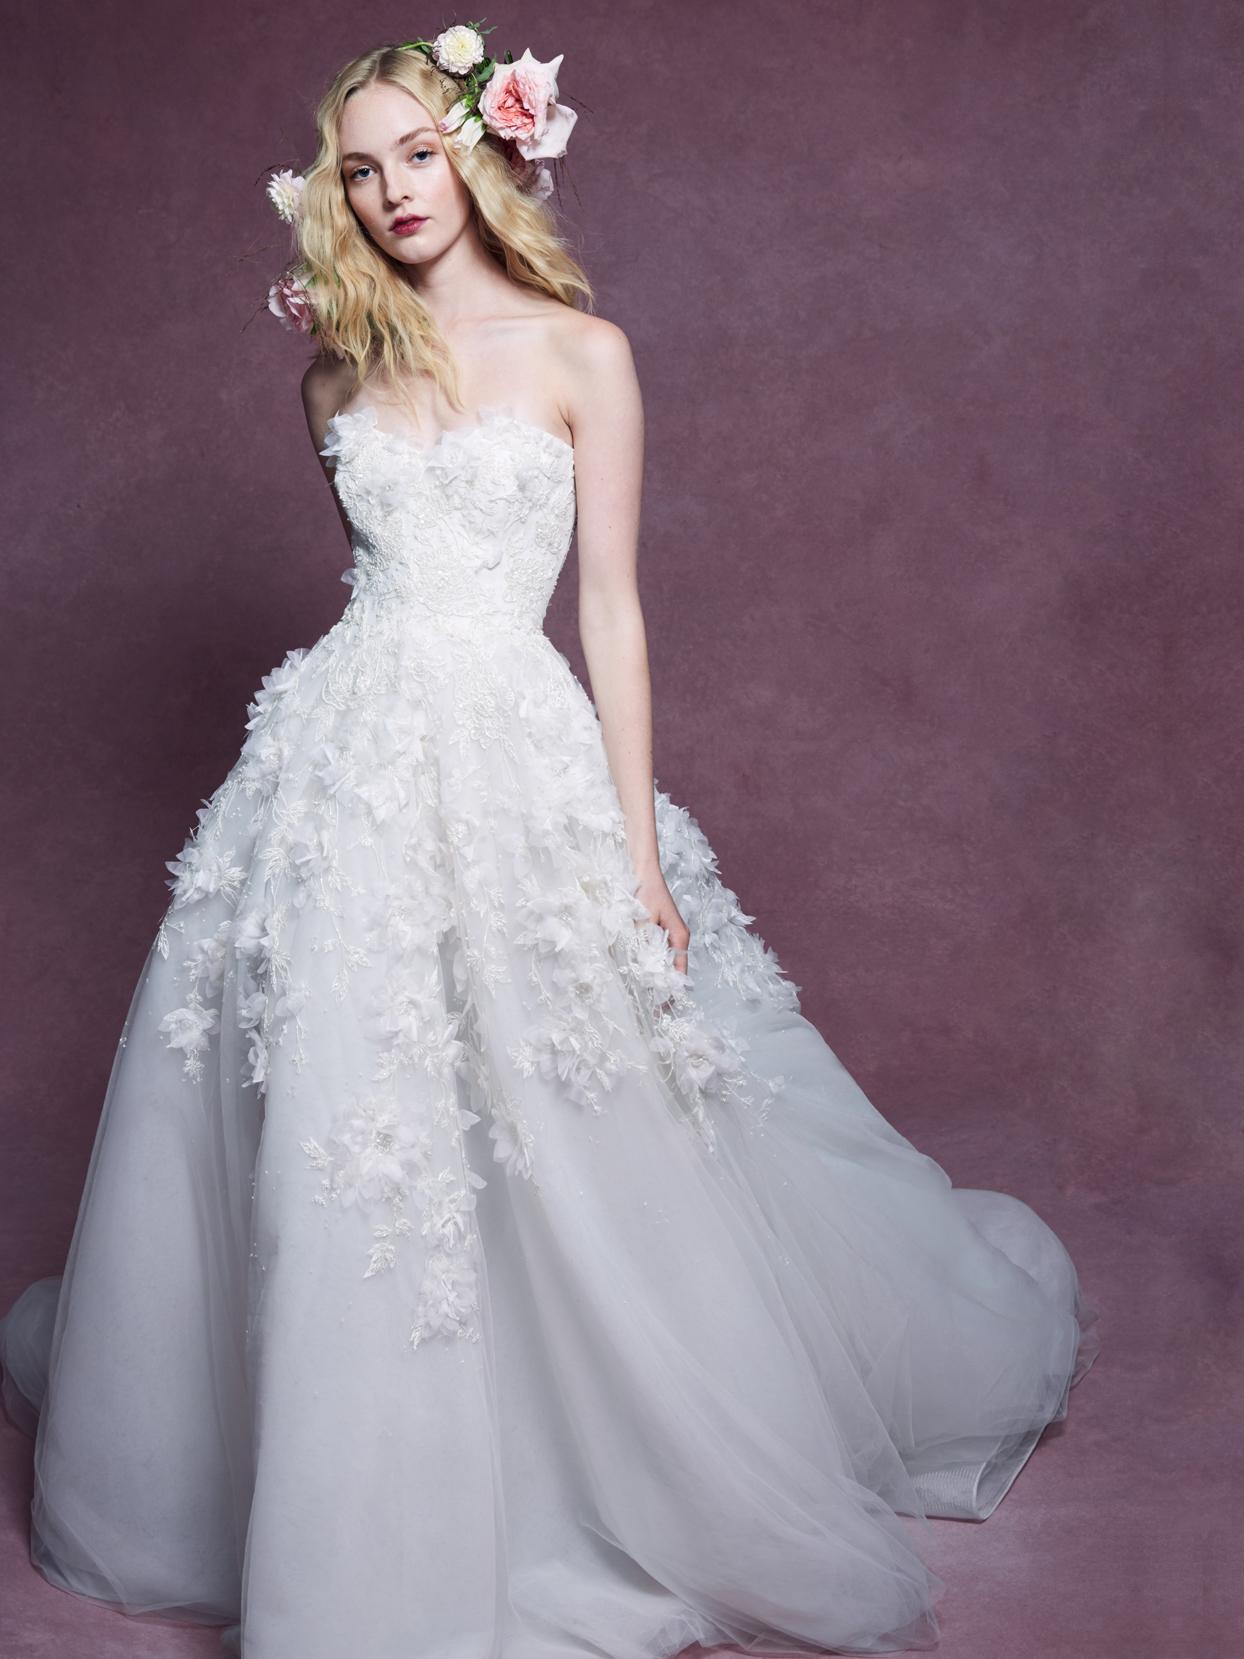 Marchesa strapless floral applique ball gown wedding dress fall 2020